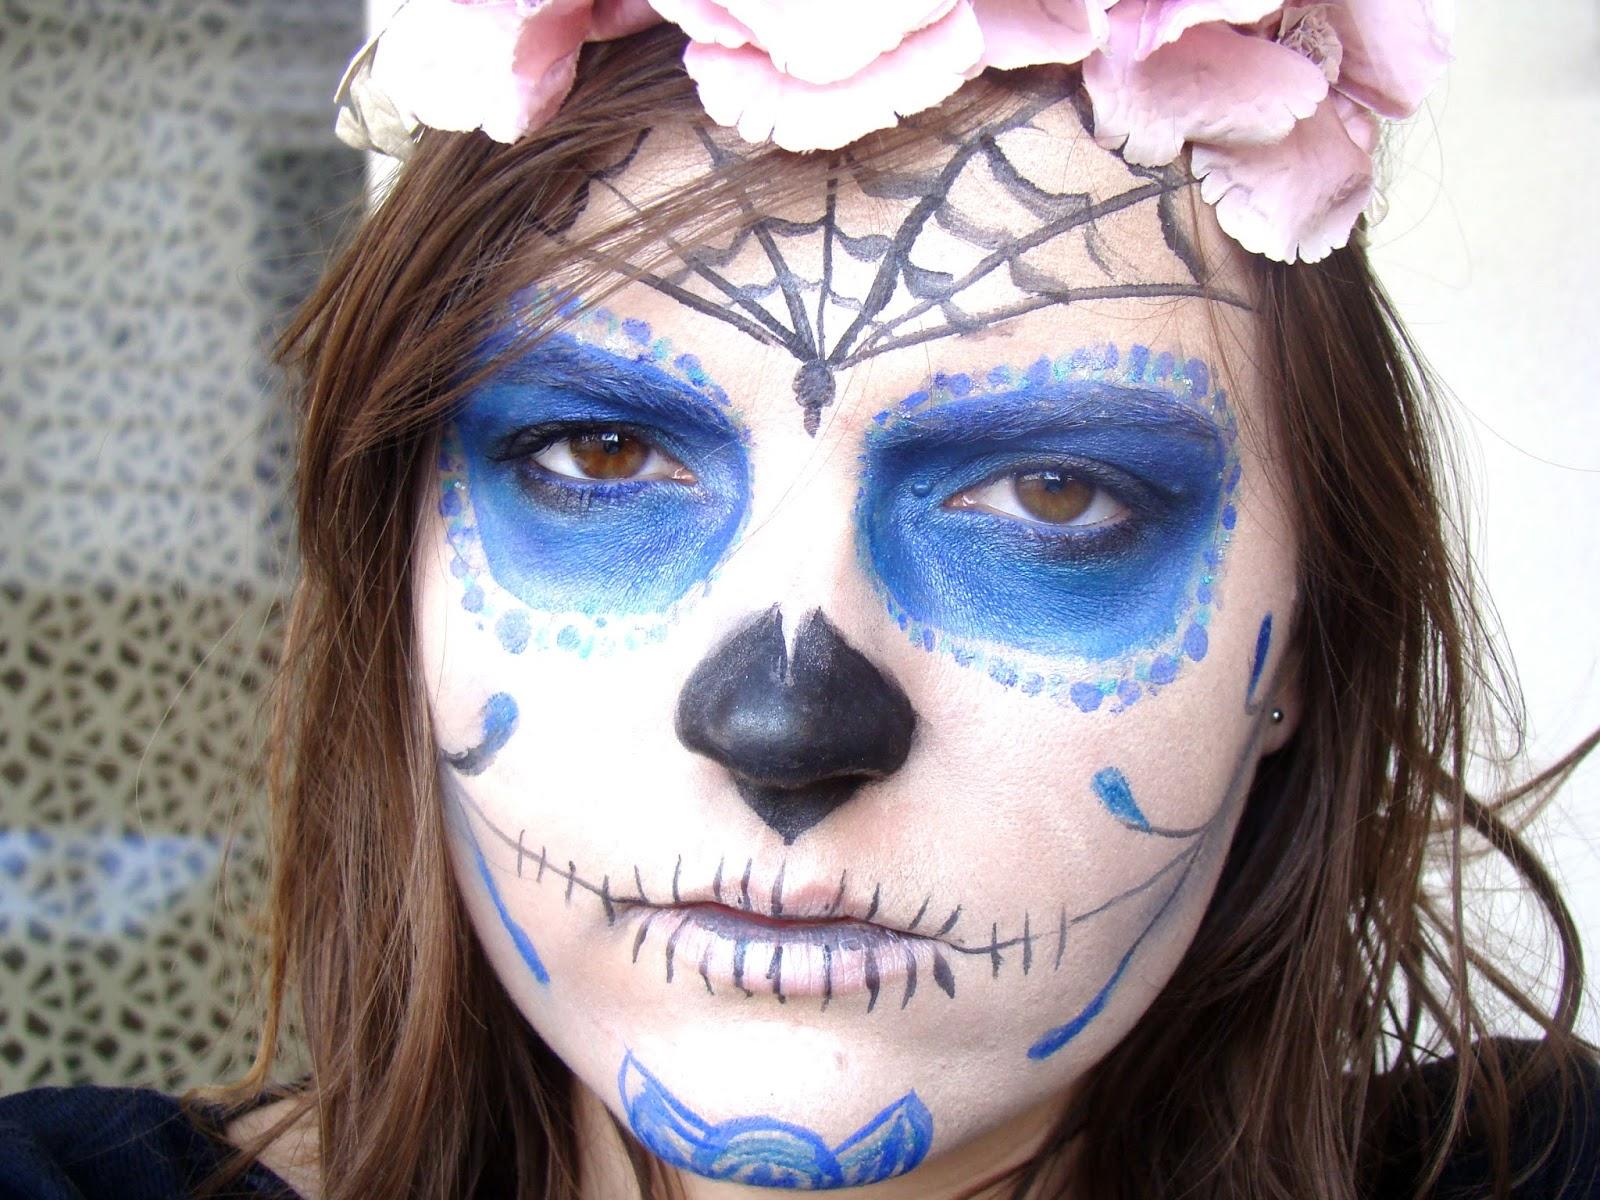 Maquillage halloween calavera autour de cia - Maquillage halloween araignee ...